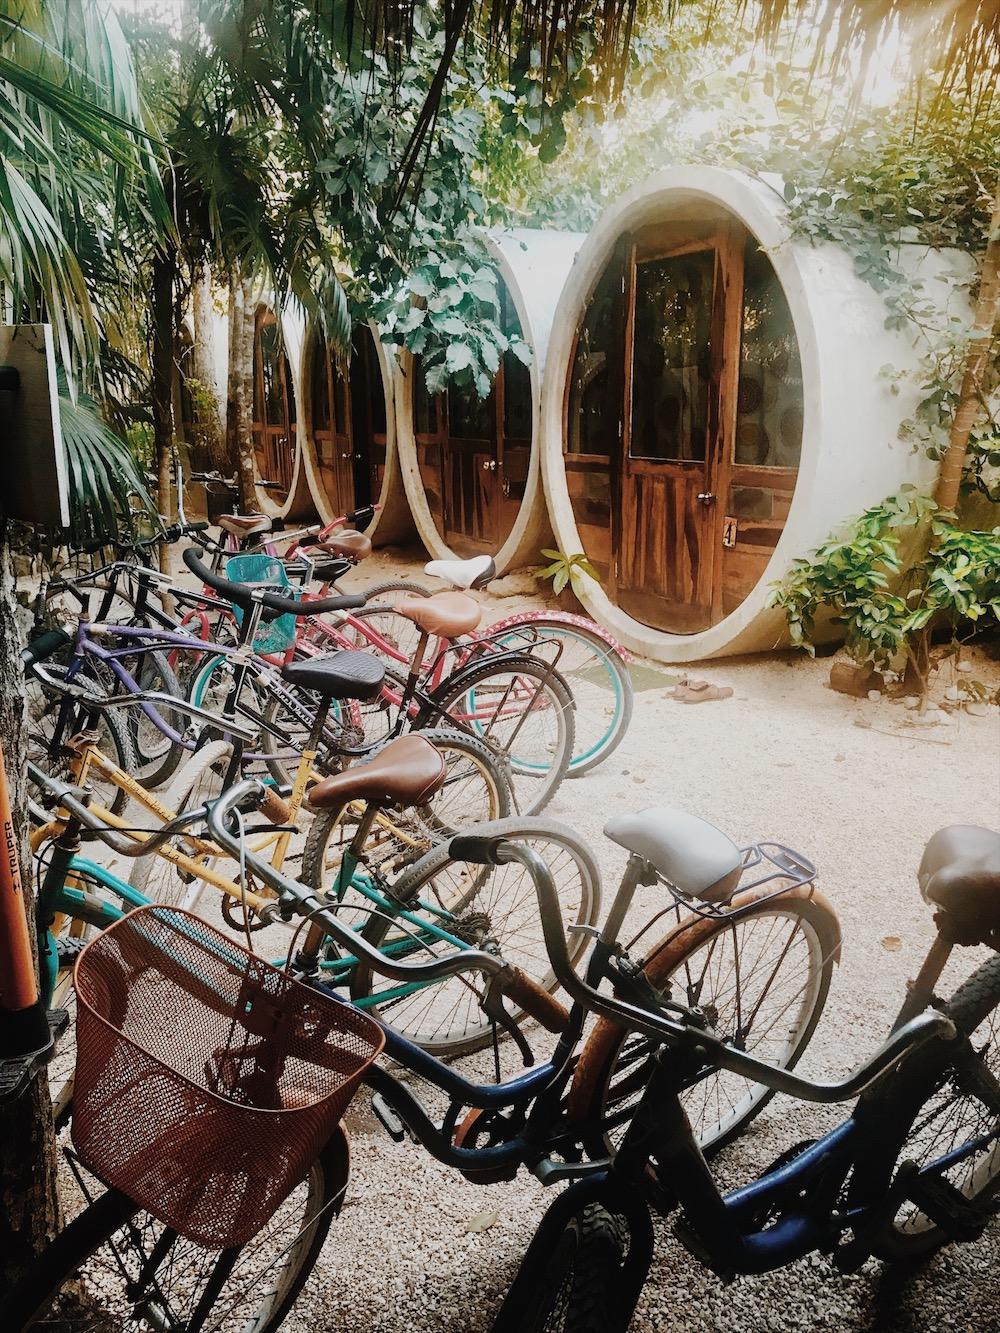 Fahrräder Verleih vom Tubo Hostel in Tulum, Mexiko